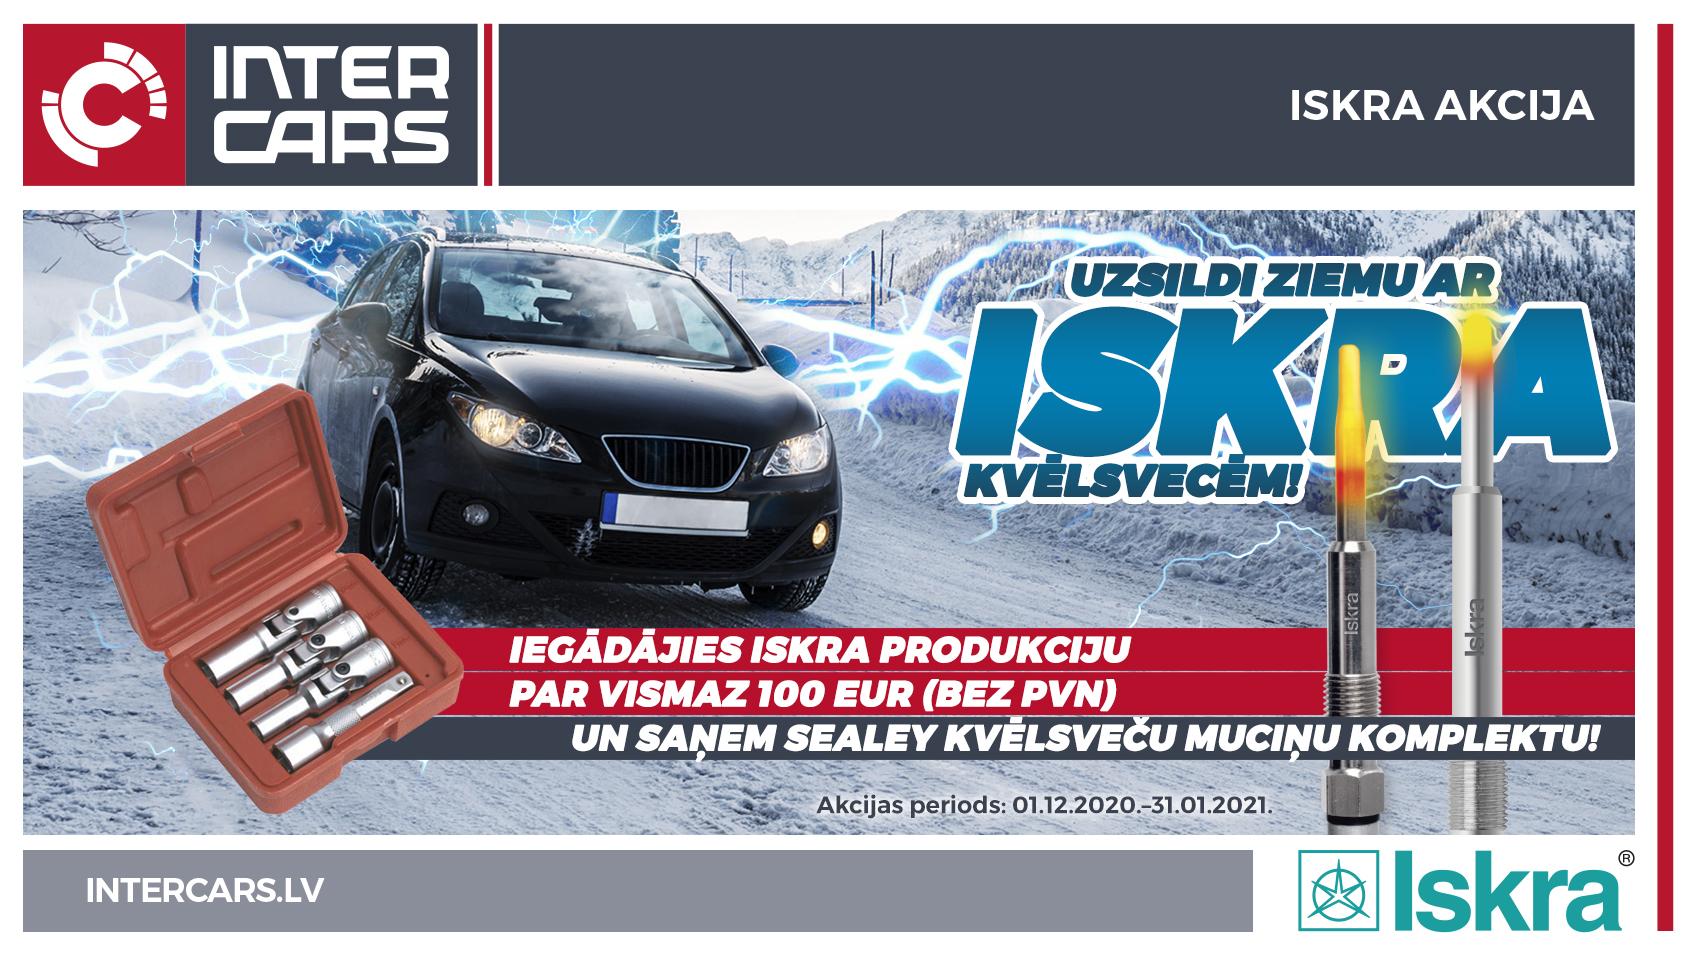 ISKRA-akcija-dec2020screen.jpg